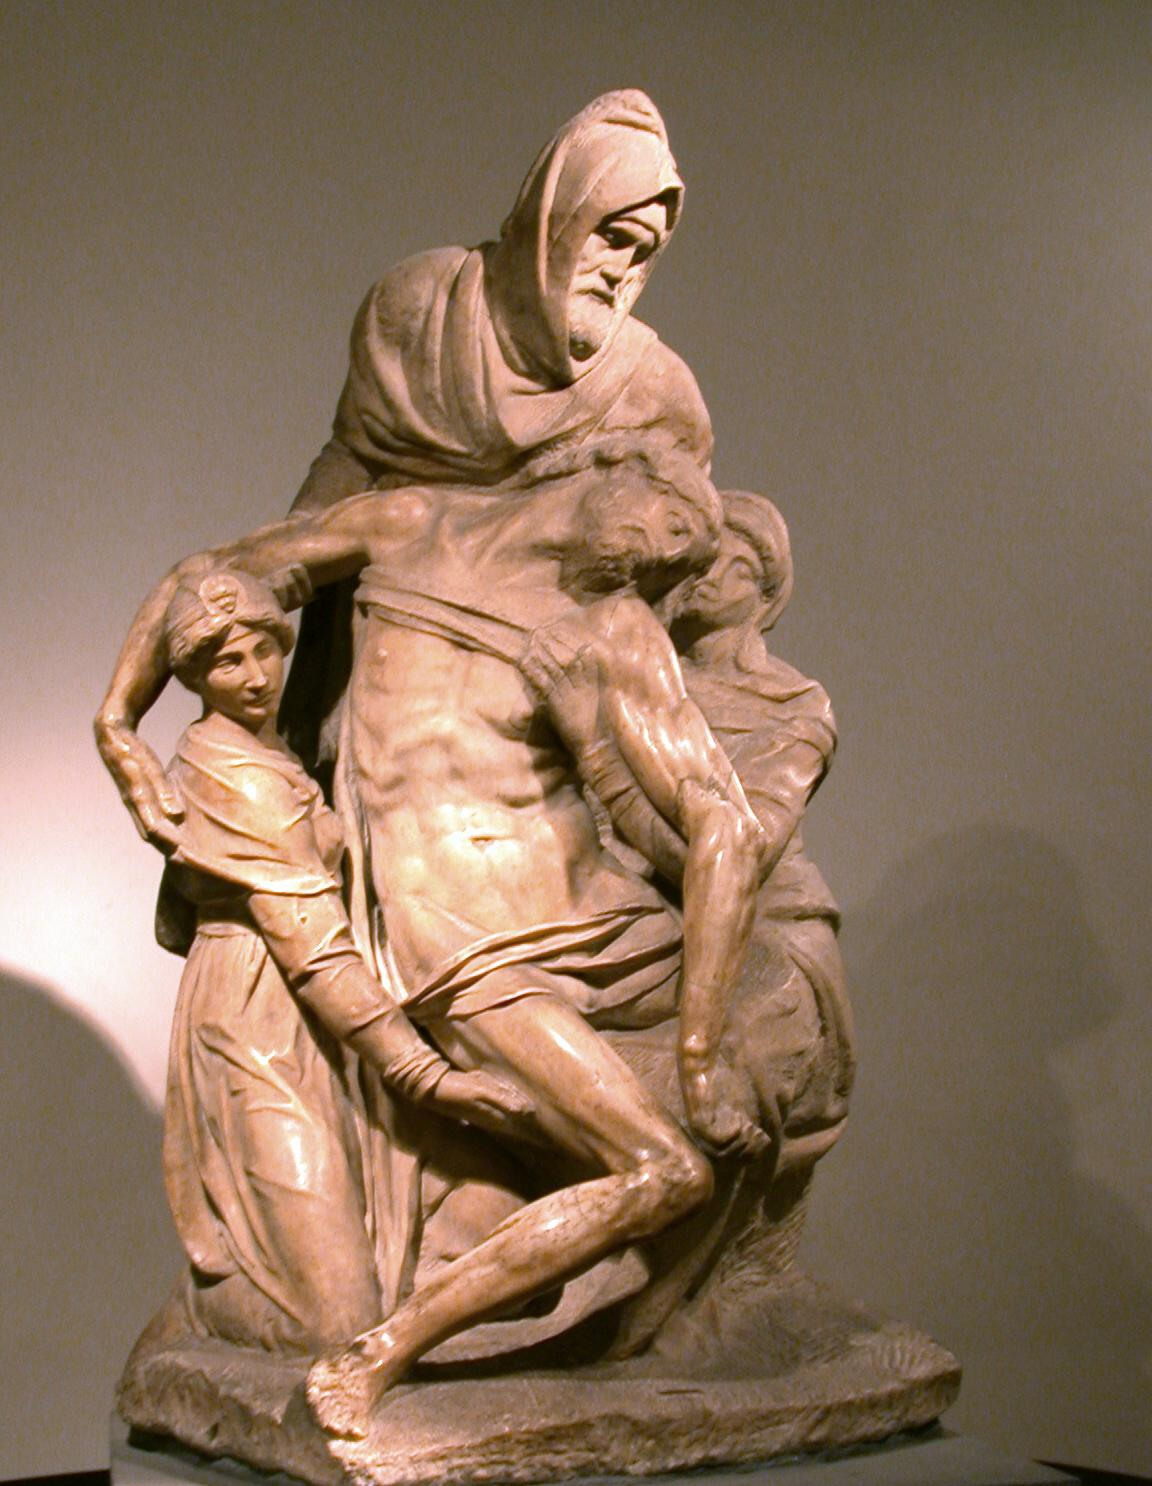 The Michelangelo Gallery